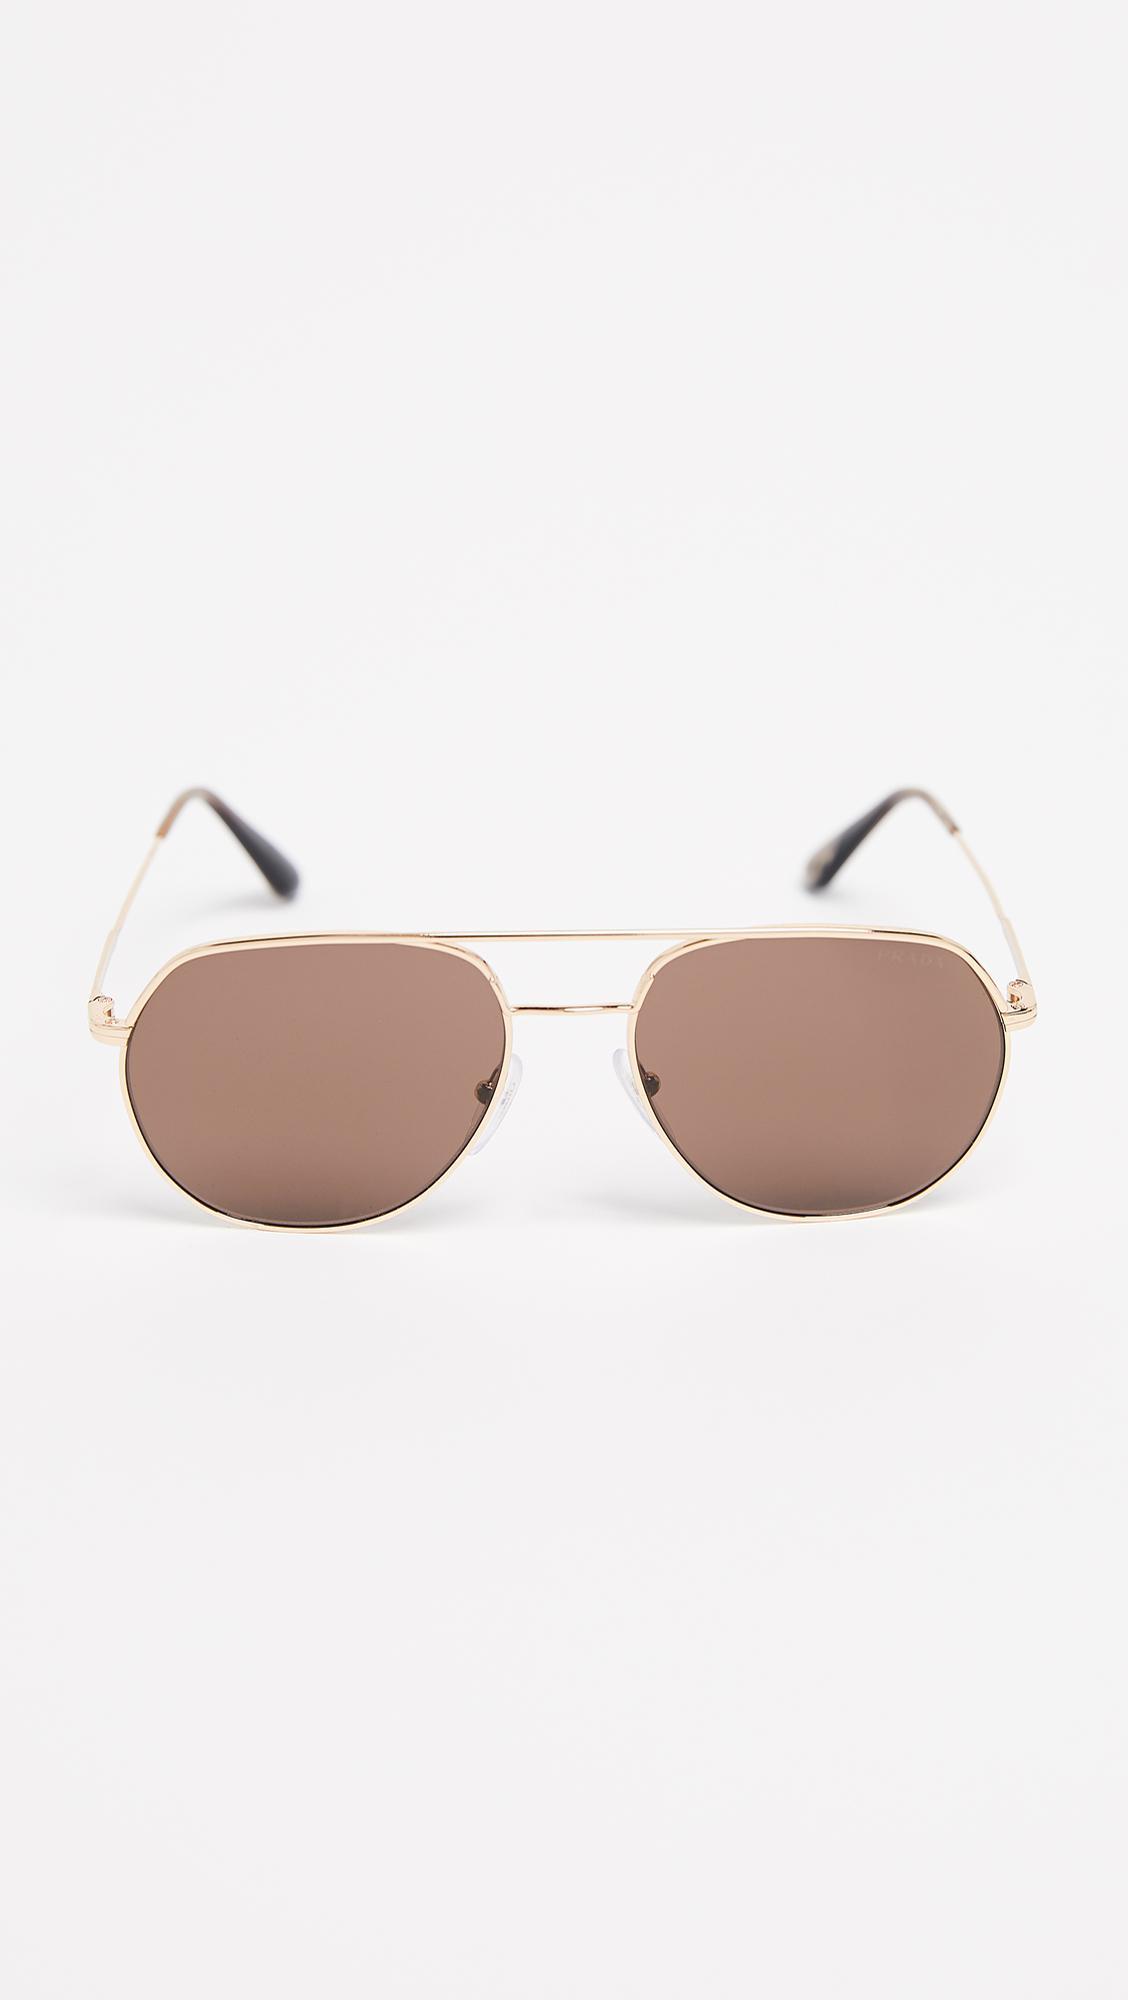 c0af4229b05 Prada Sunglasses for Men - Lyst